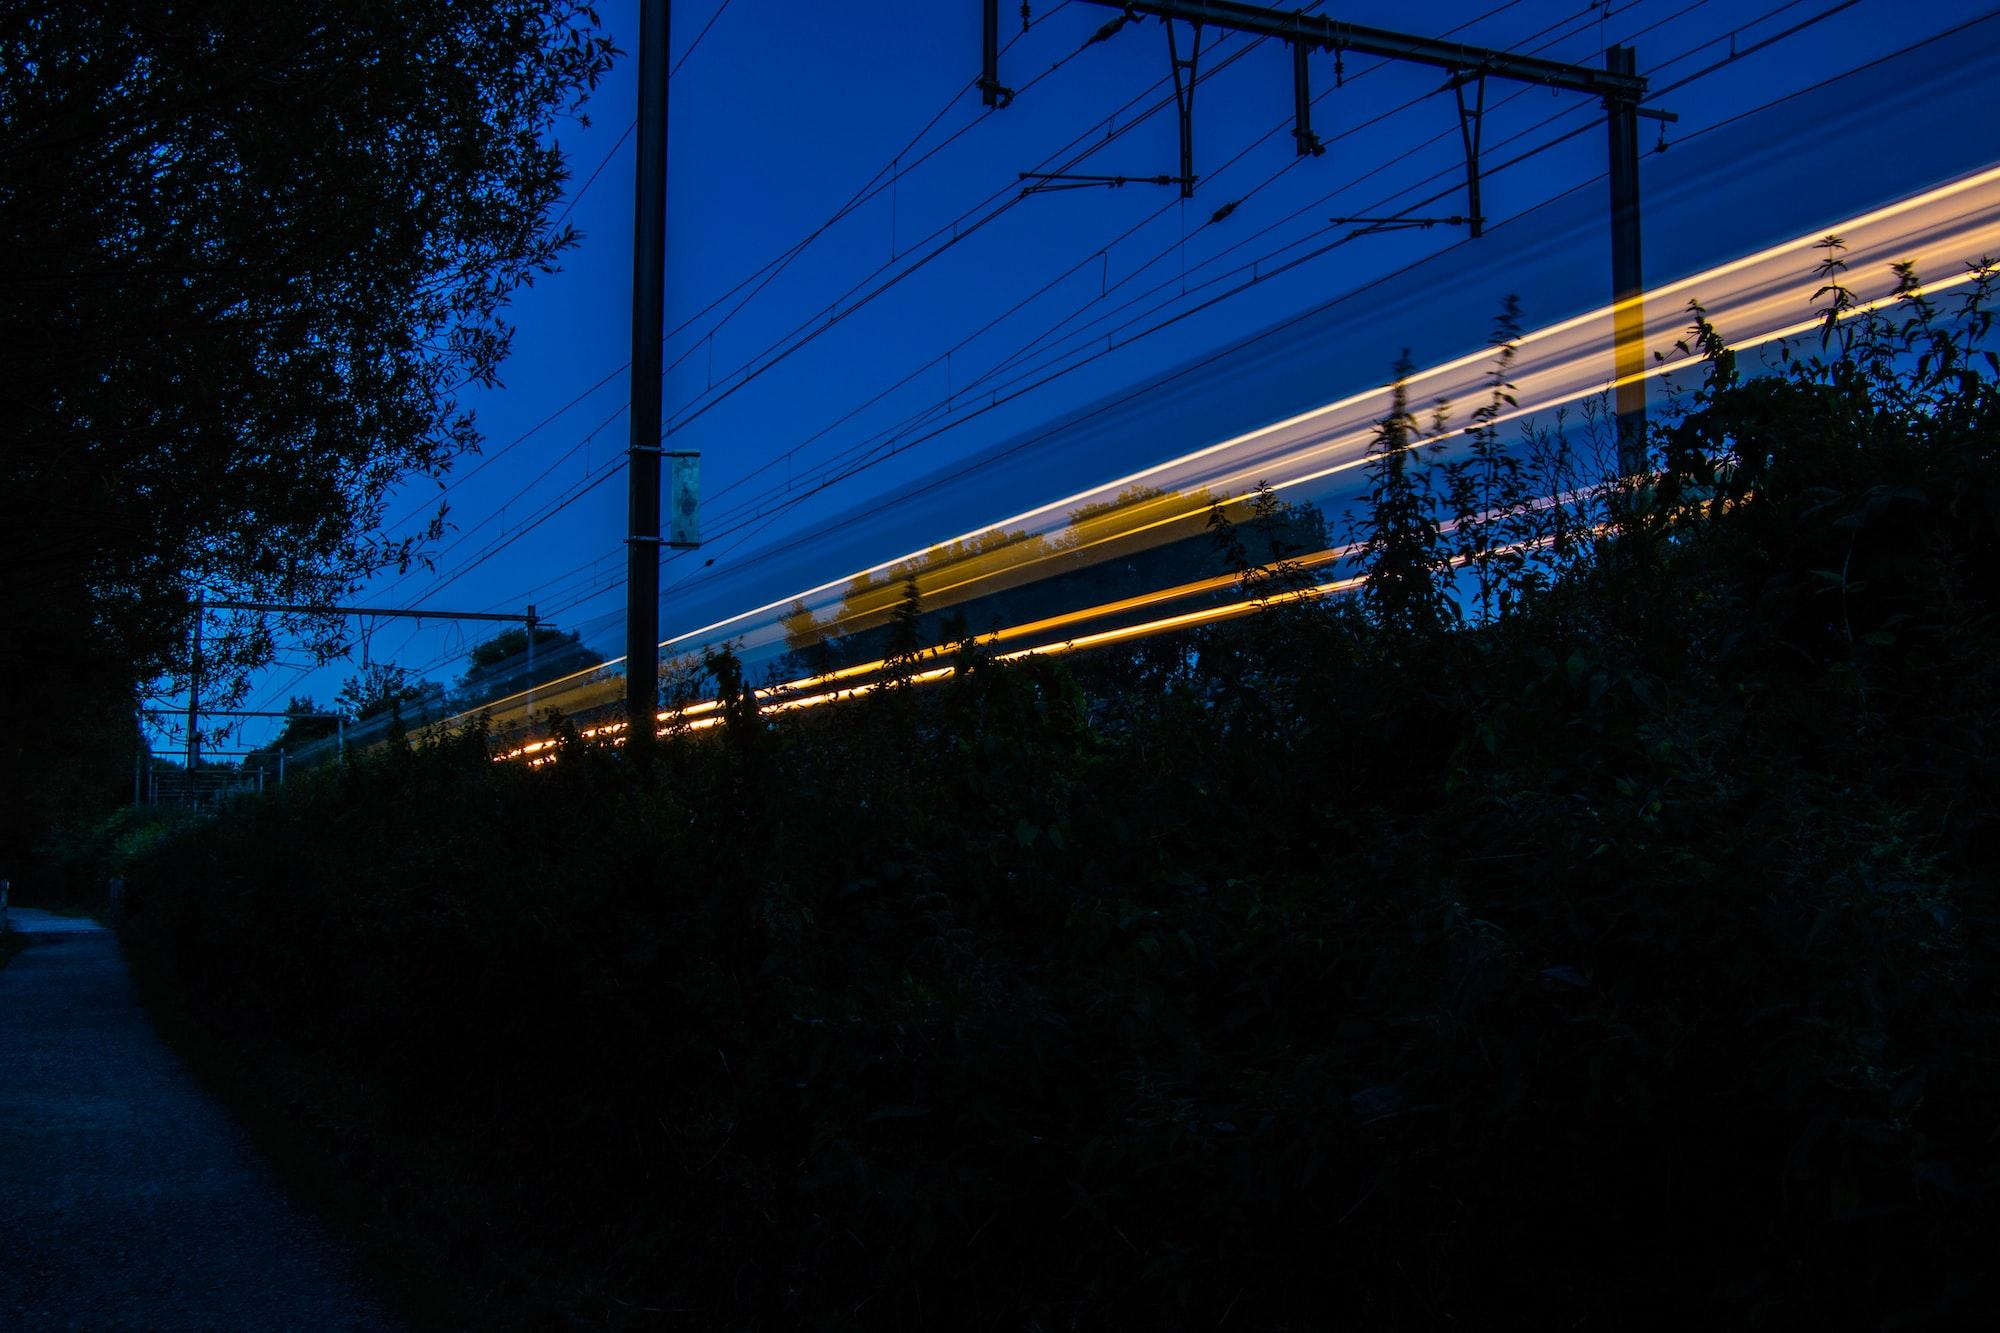 Train track light trail in Jette